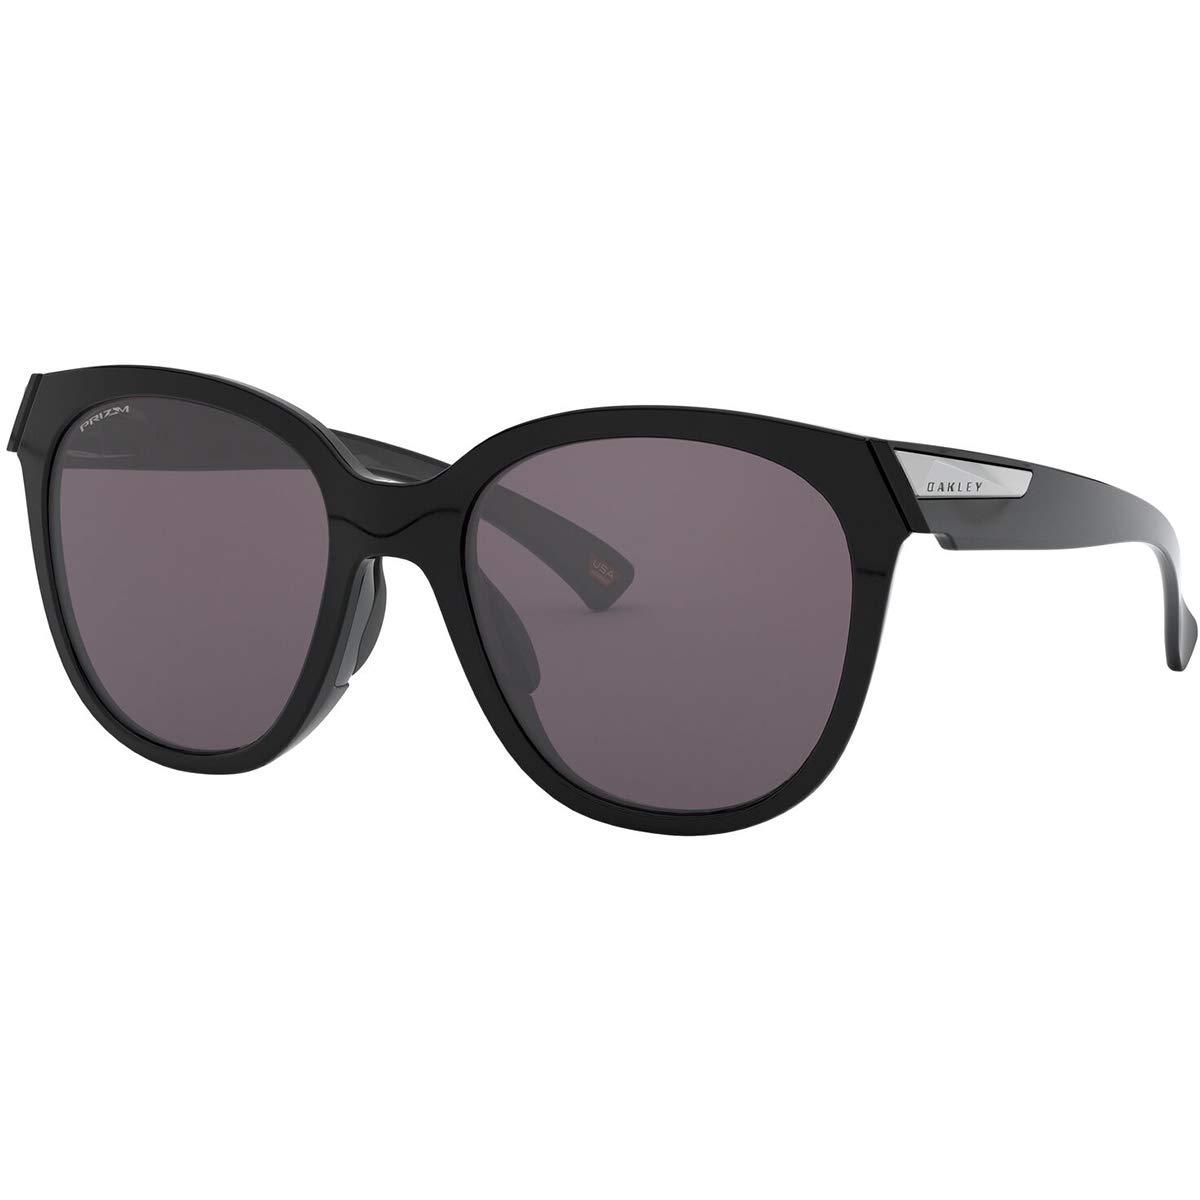 Oakley Women's Low Key Sunglasses,OS,Polished Black/Prizm Grey by Oakley